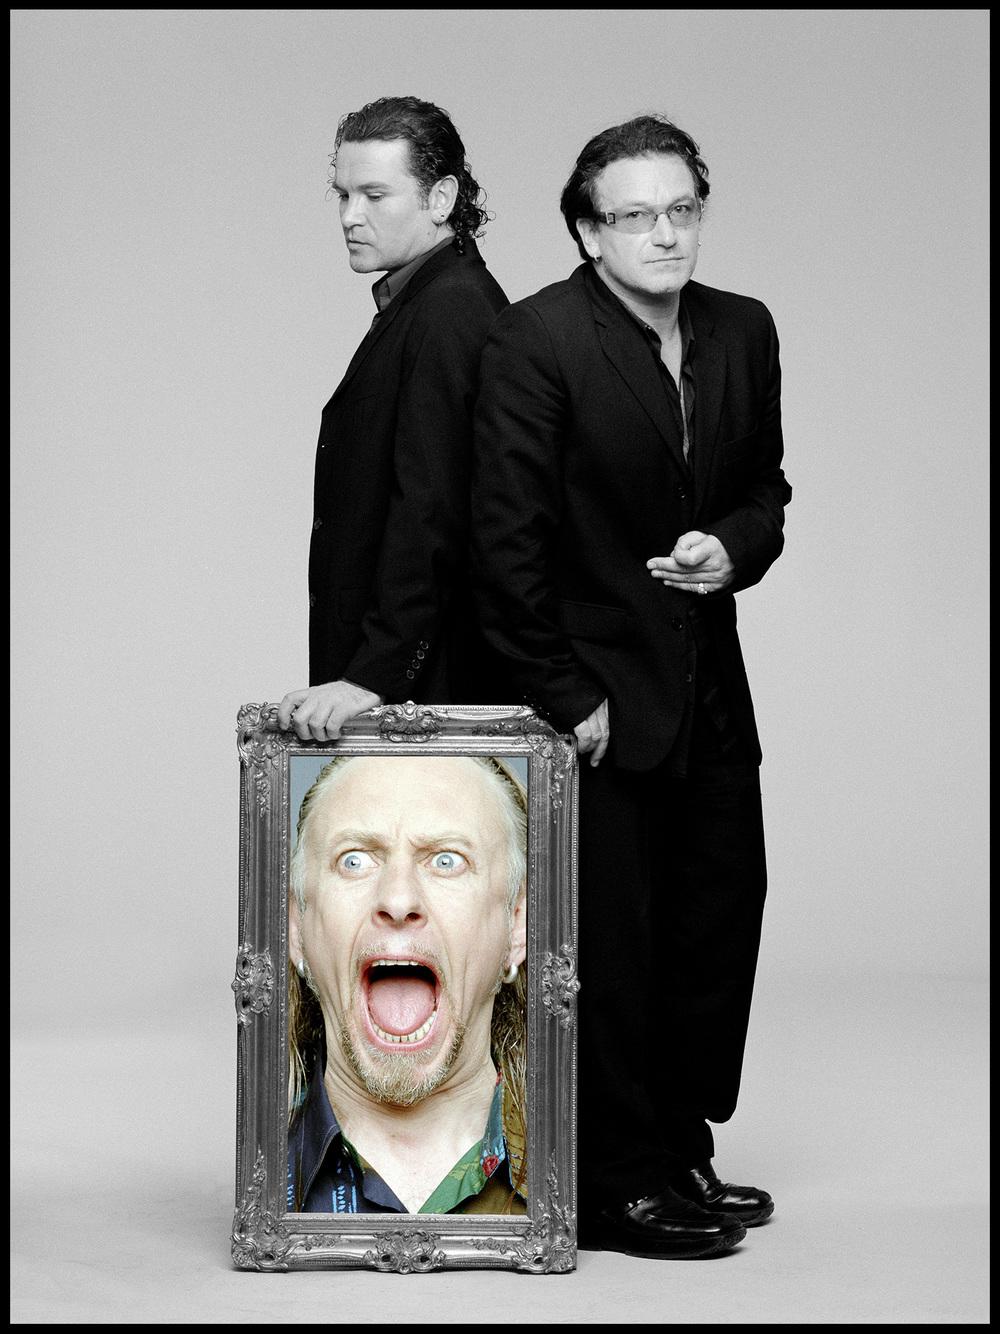 Gavin, Bono & Guggi